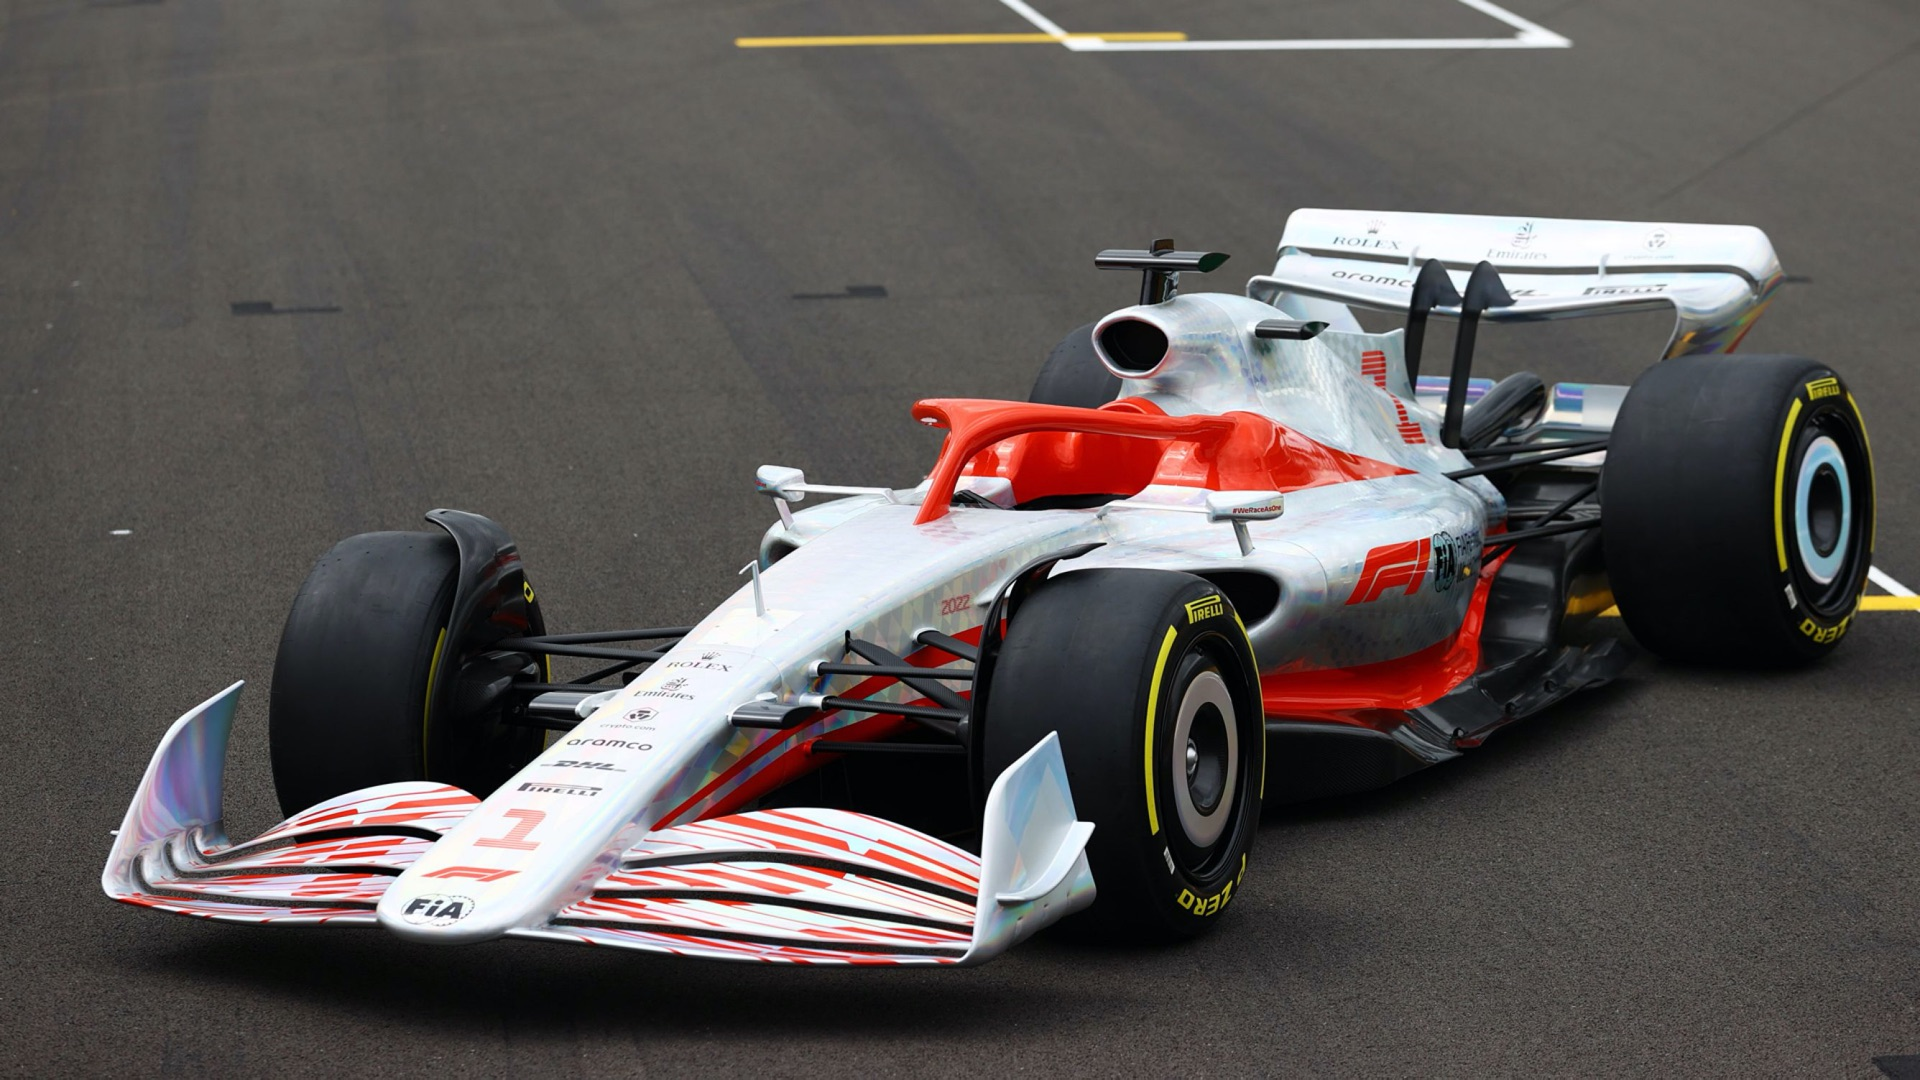 F1-Formula-1-car-2022-3_1920x1080